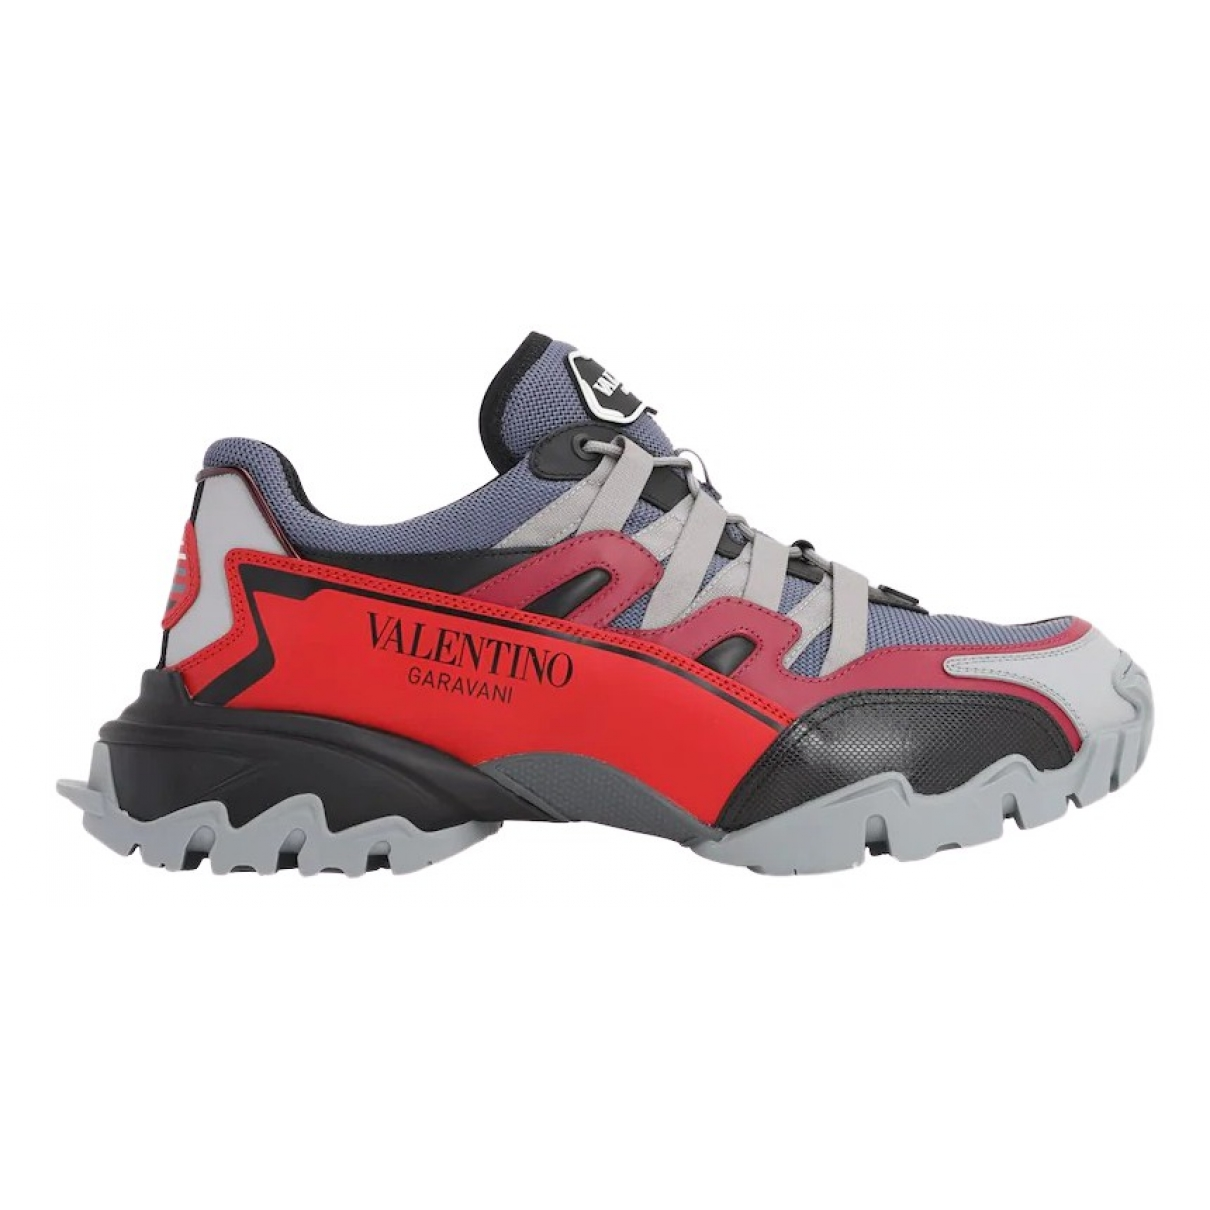 Valentino Garavani \N Red Leather Trainers for Men 41 EU